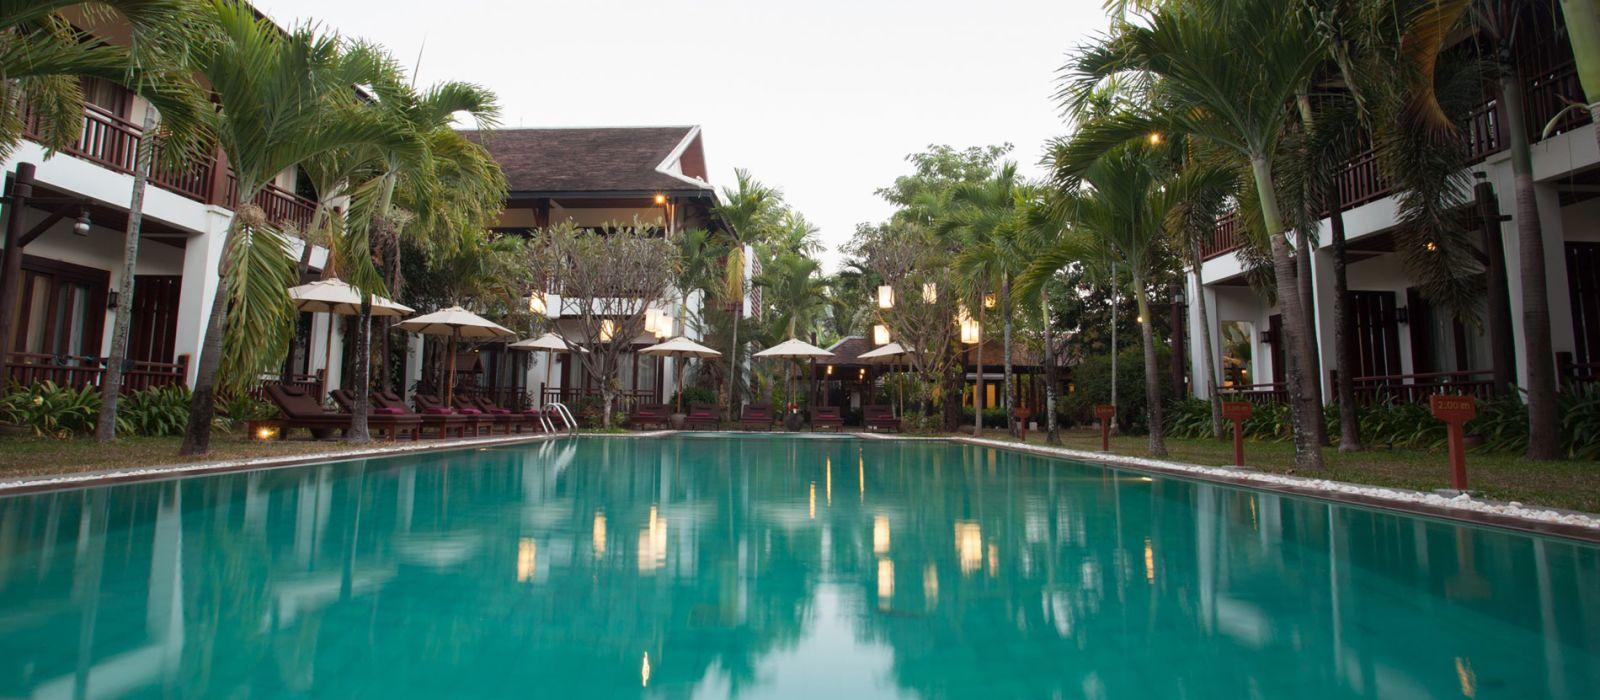 Hotel Green Park Boutique  Laos